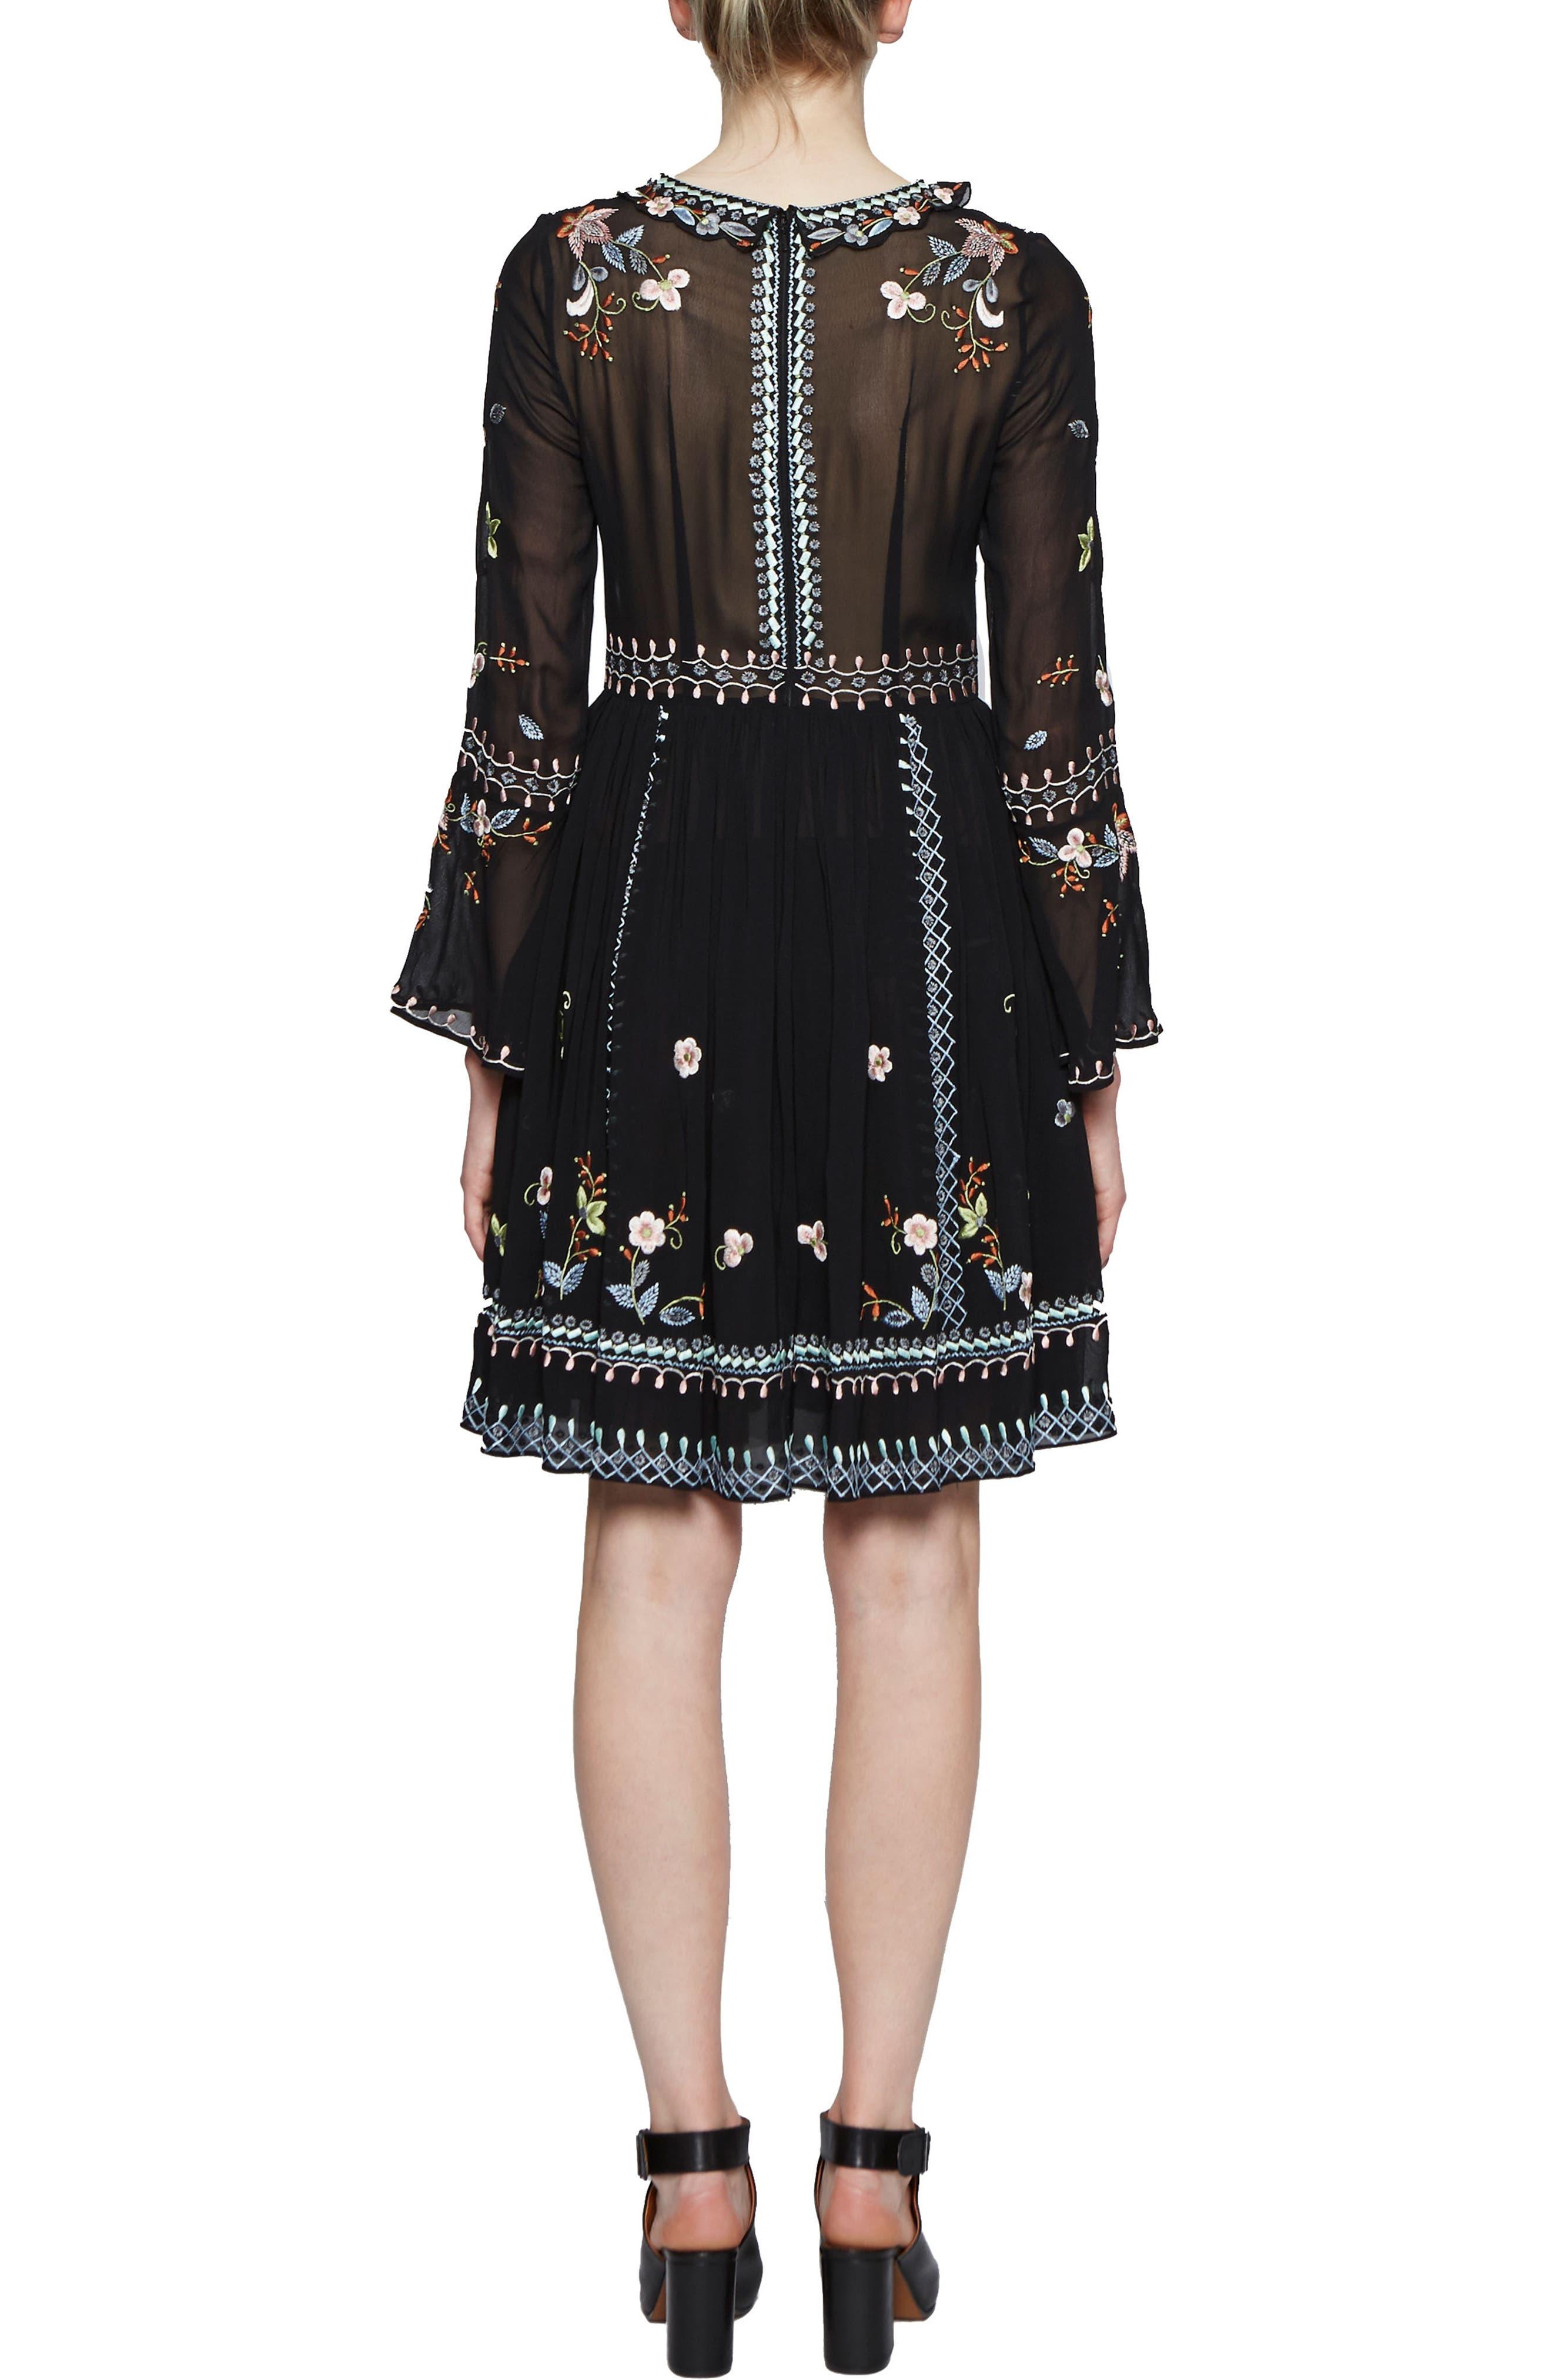 FRENCH CONNECTION,                             Bijou Stitch A-Line Dress,                             Alternate thumbnail 2, color,                             007